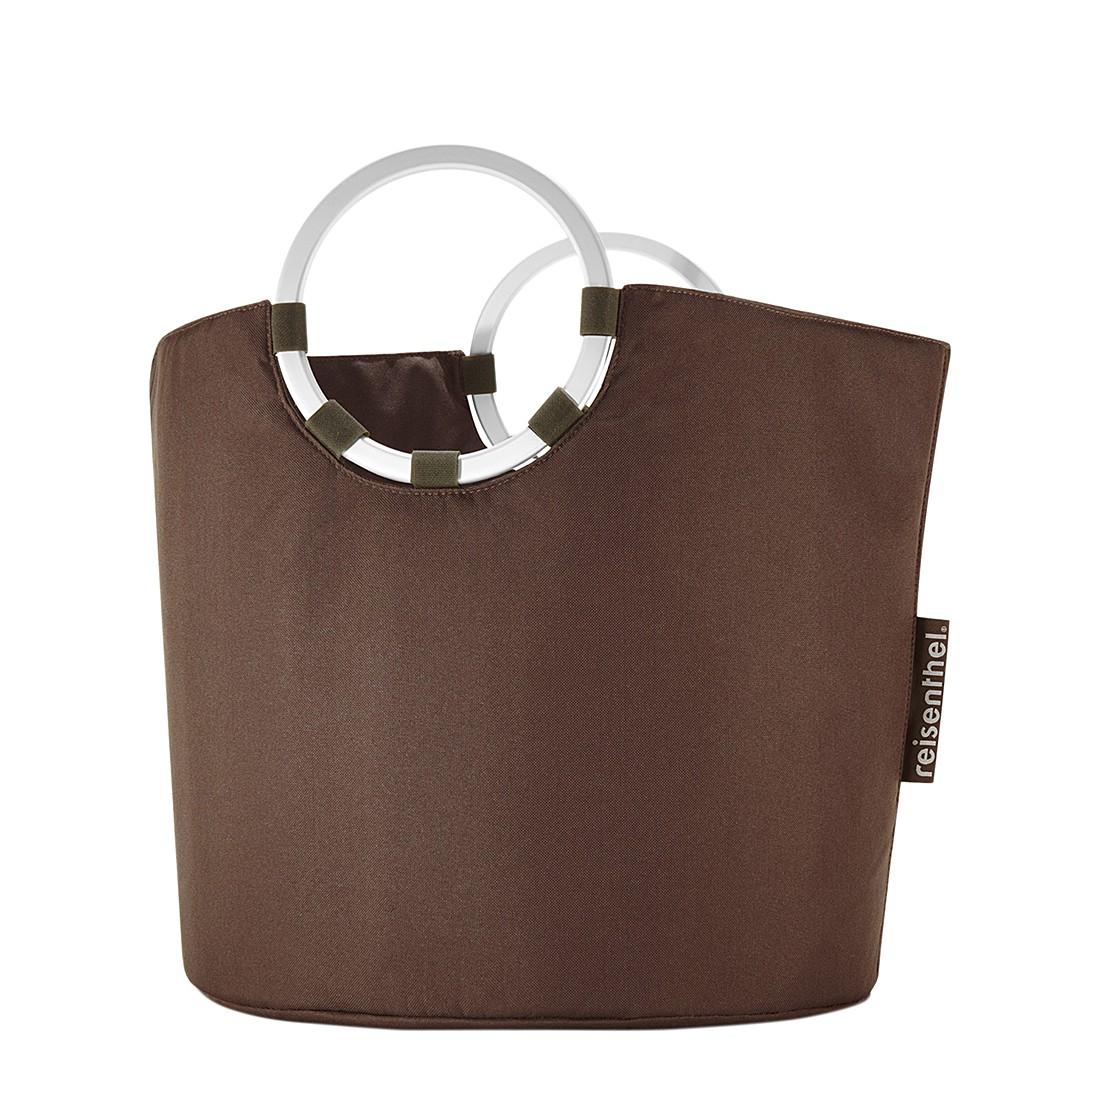 loophome mokka strapazierf hig braun reisenthel accessoires online bestellen. Black Bedroom Furniture Sets. Home Design Ideas